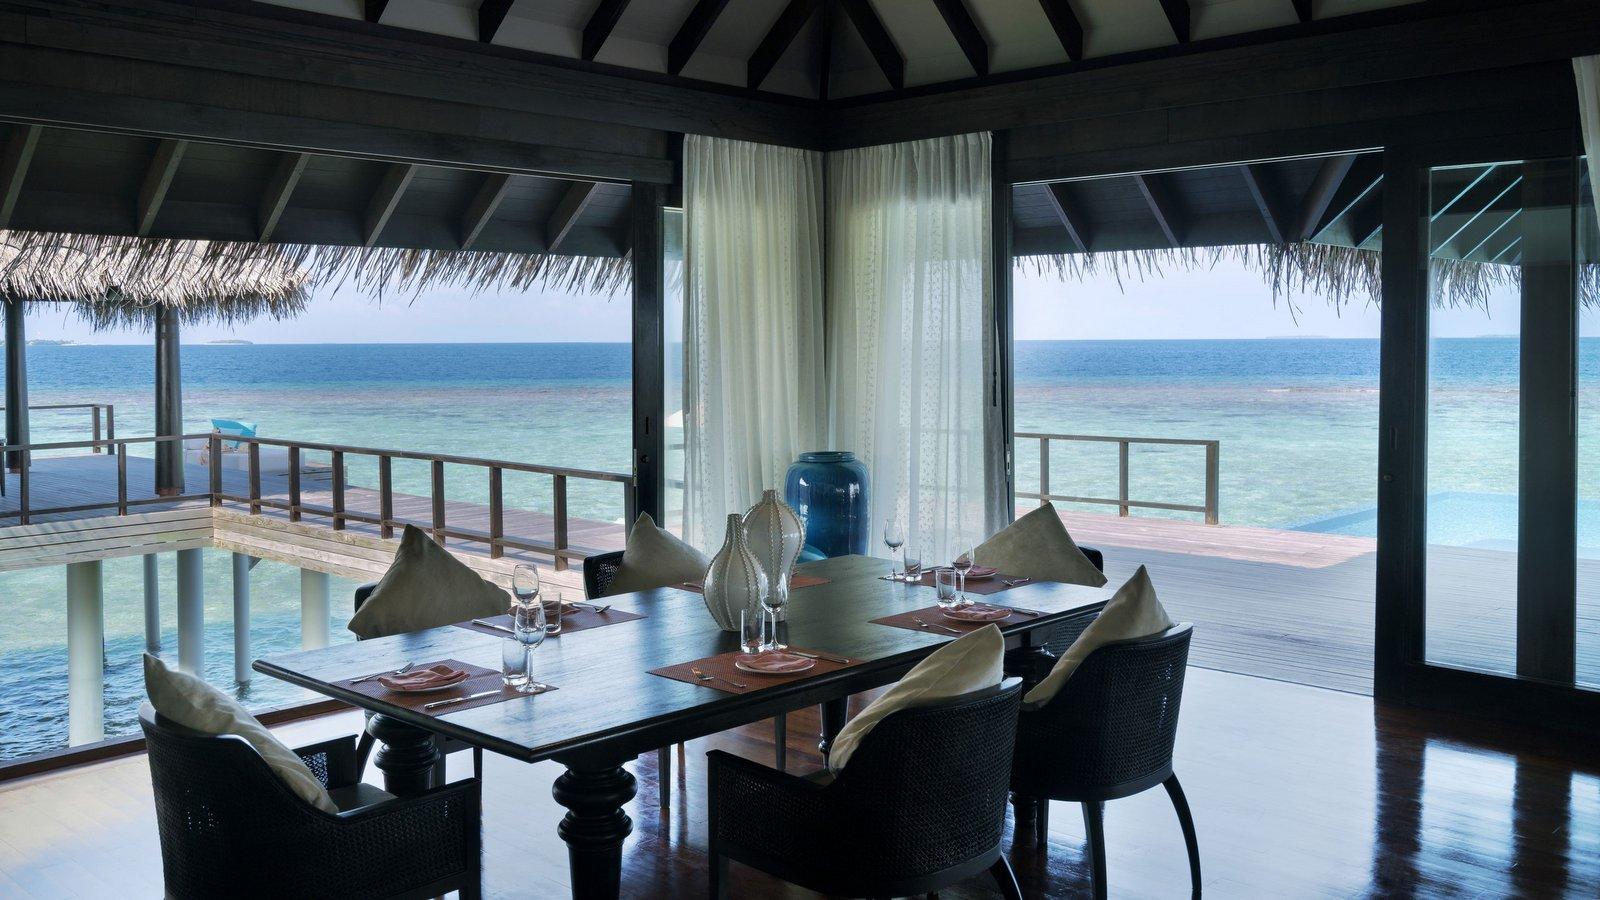 Мальдивы, отель Anantara Kihavah Maldives Villas, номер Two-Bedroom Over Water Pool Residence